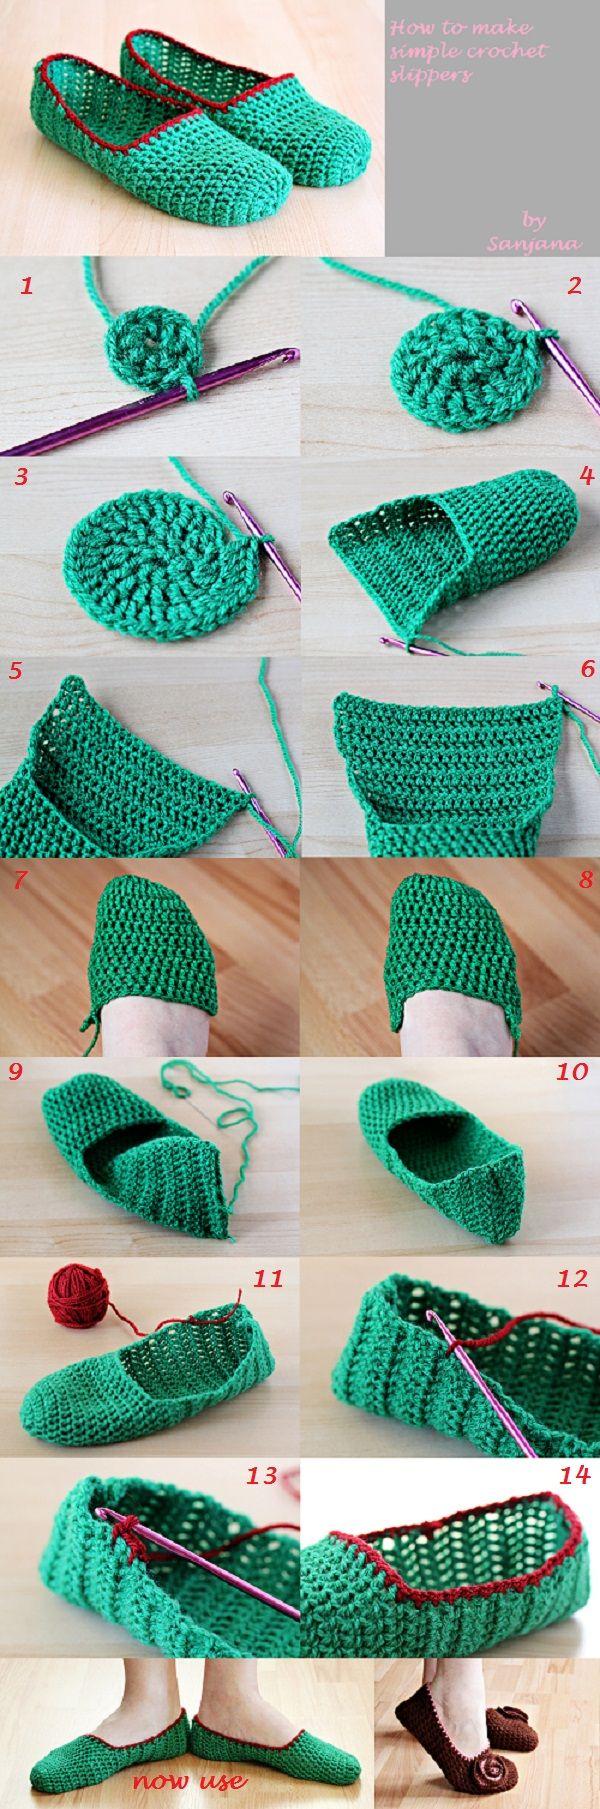 How to Make Simple Crochet Slippers | Yo quiero estos!! | Pinterest ...